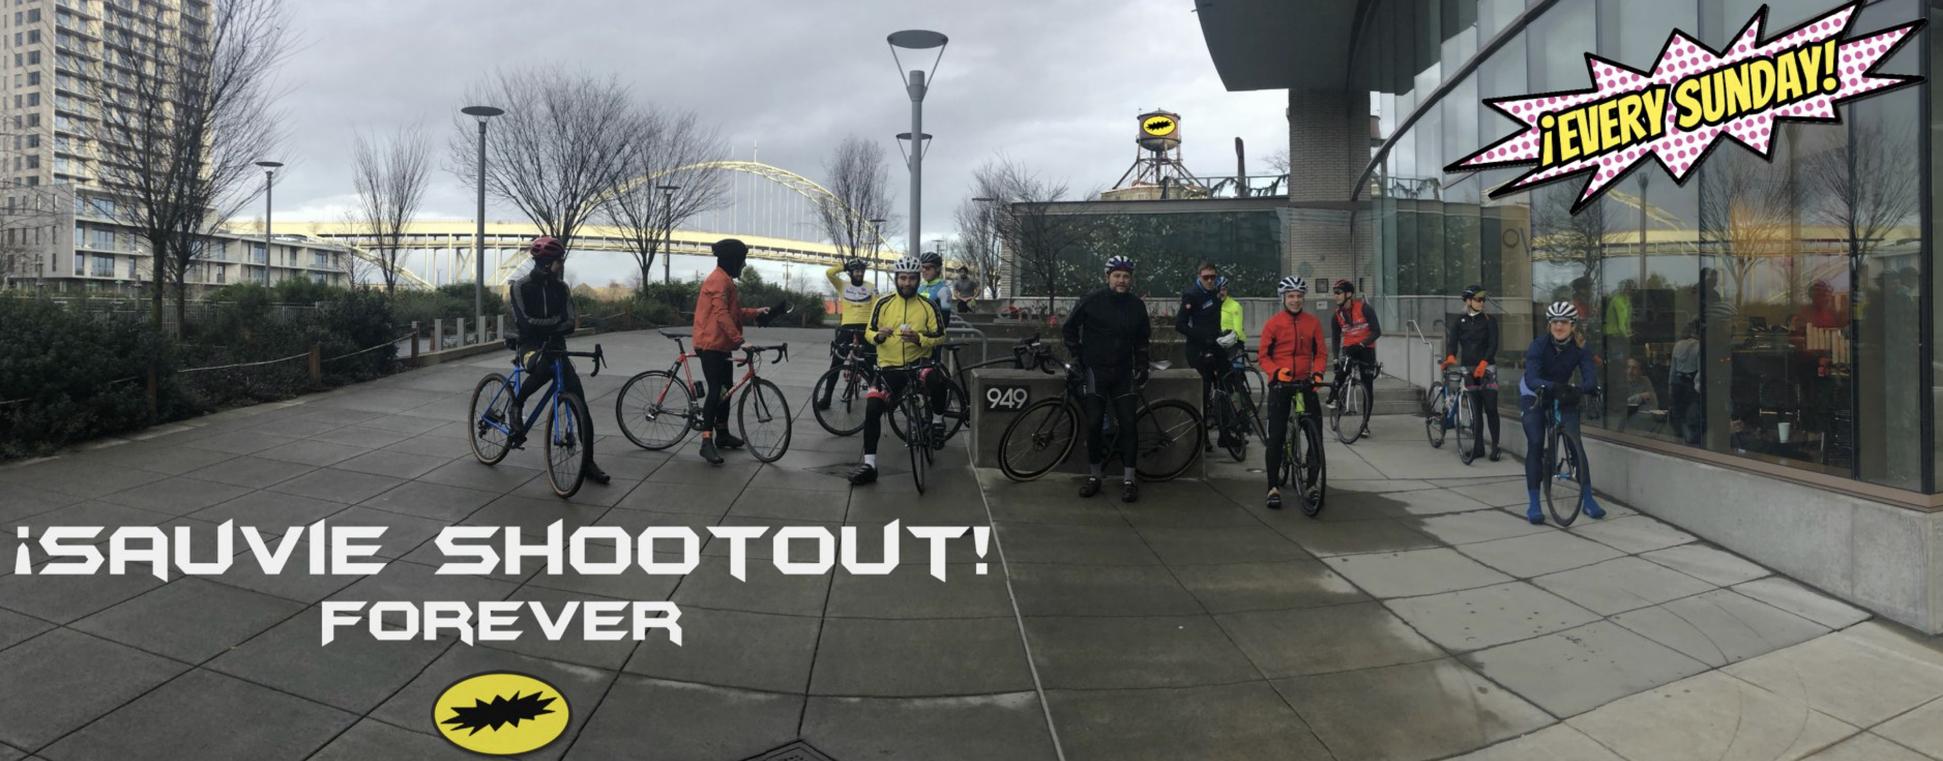 70f8306be Cyclist sues TriMet - BikePortland.org